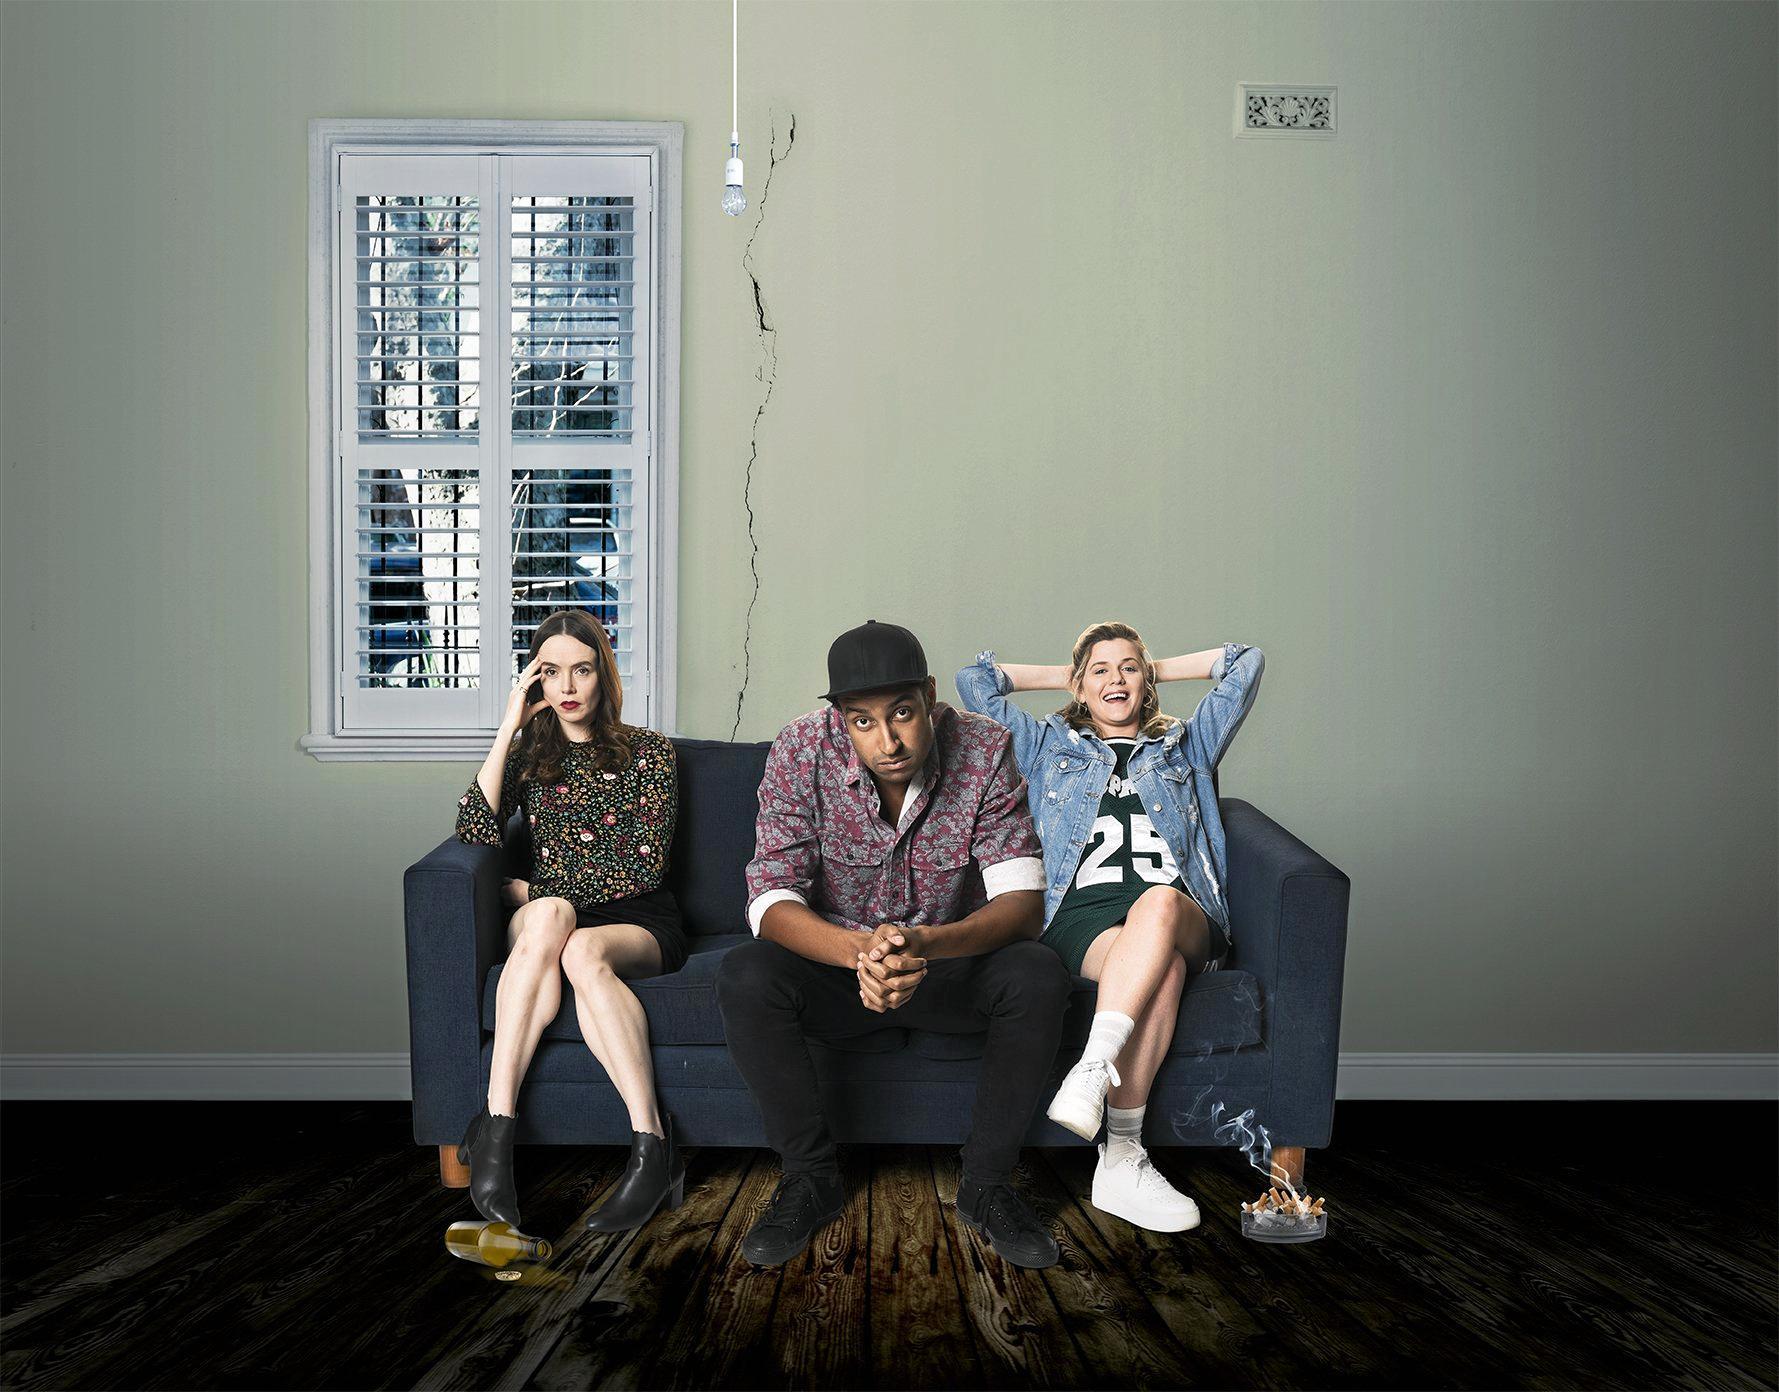 Valene Kane, Matt Okine and Harriet Dyer star in the TV series The Other Guy.